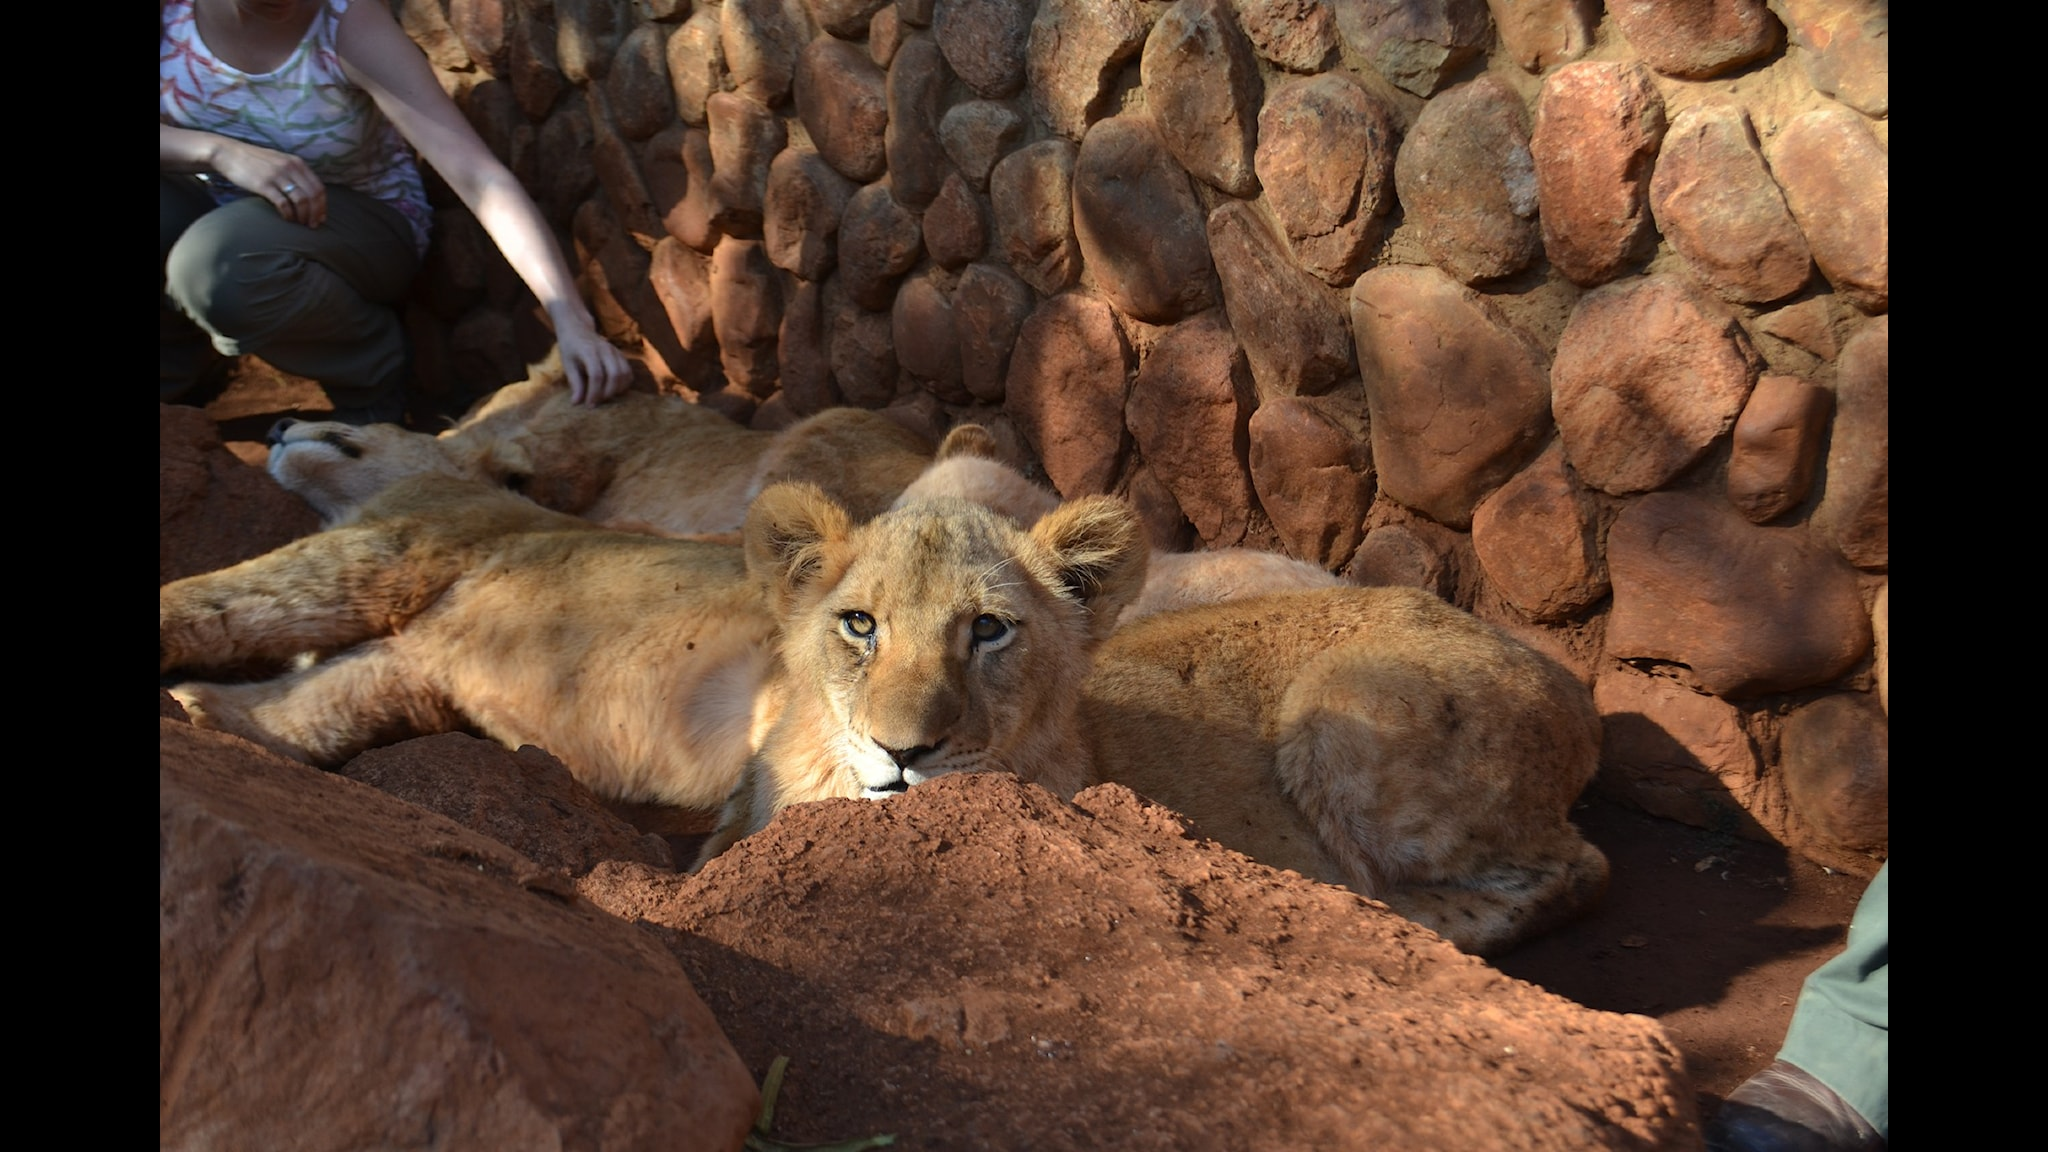 Lejon i fångenskap